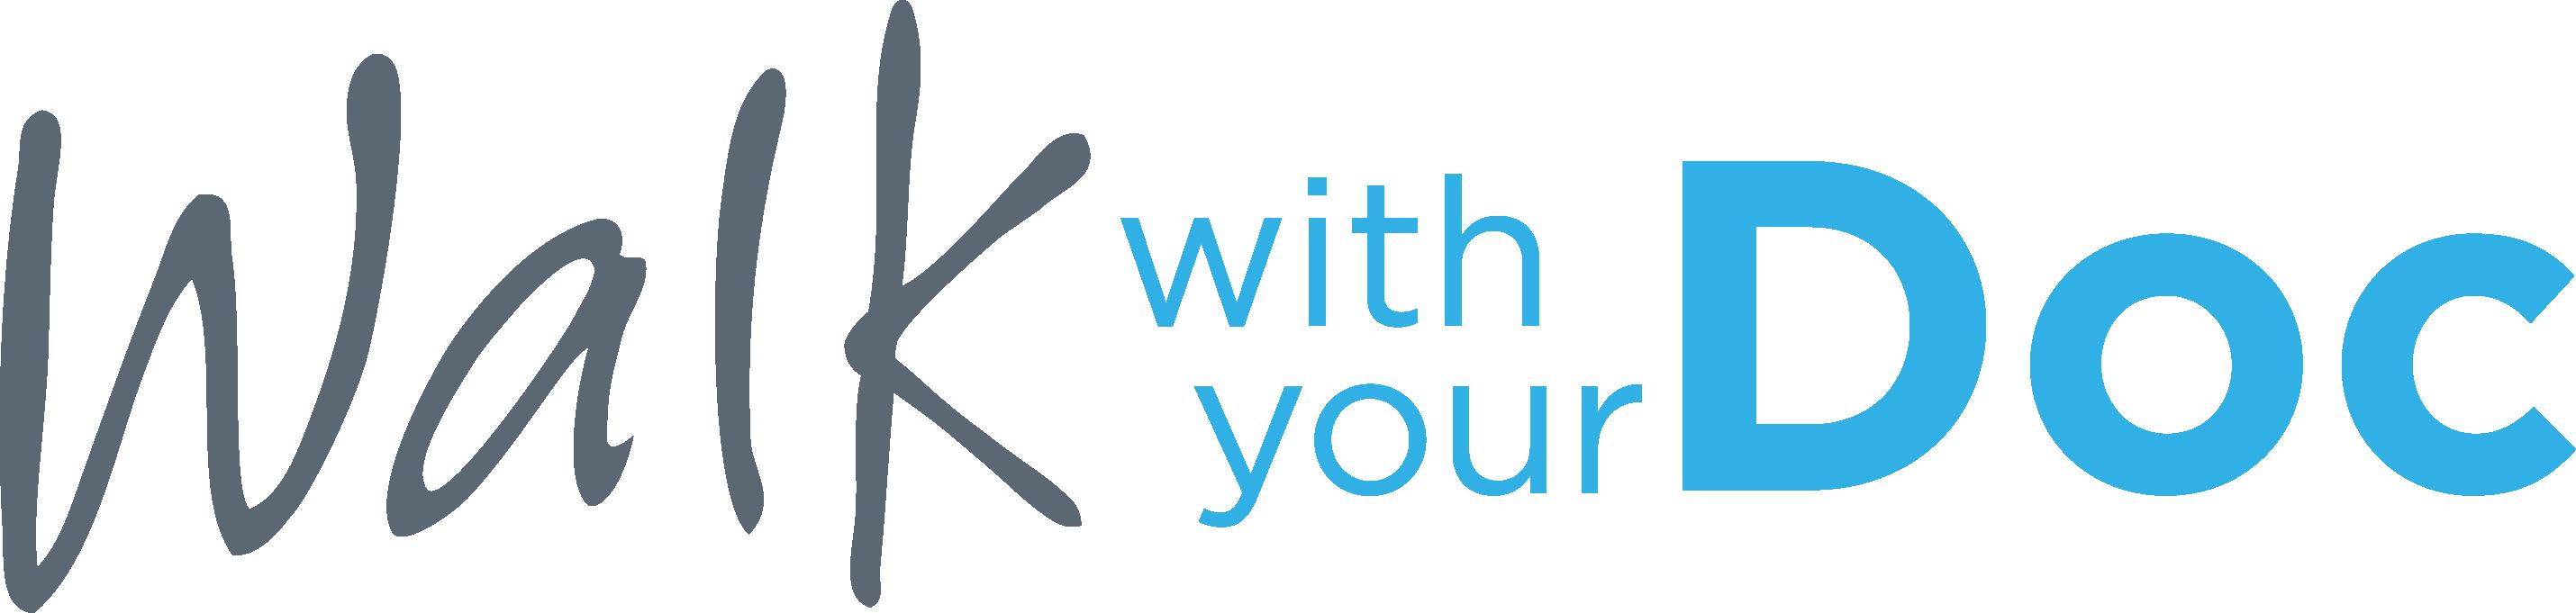 walk with your doc logo cmyk